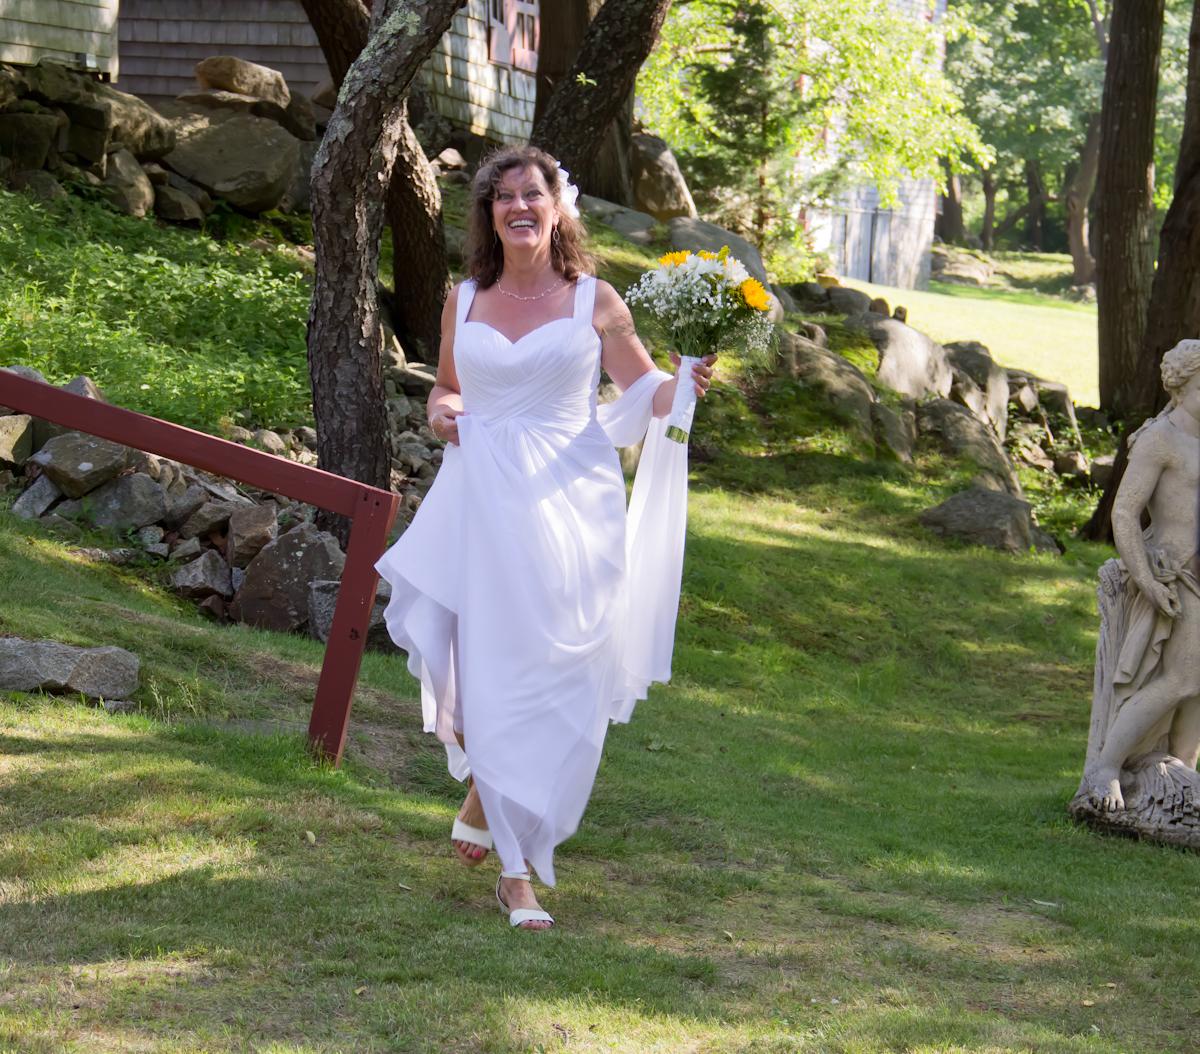 Wedding bride ceremony outdoors